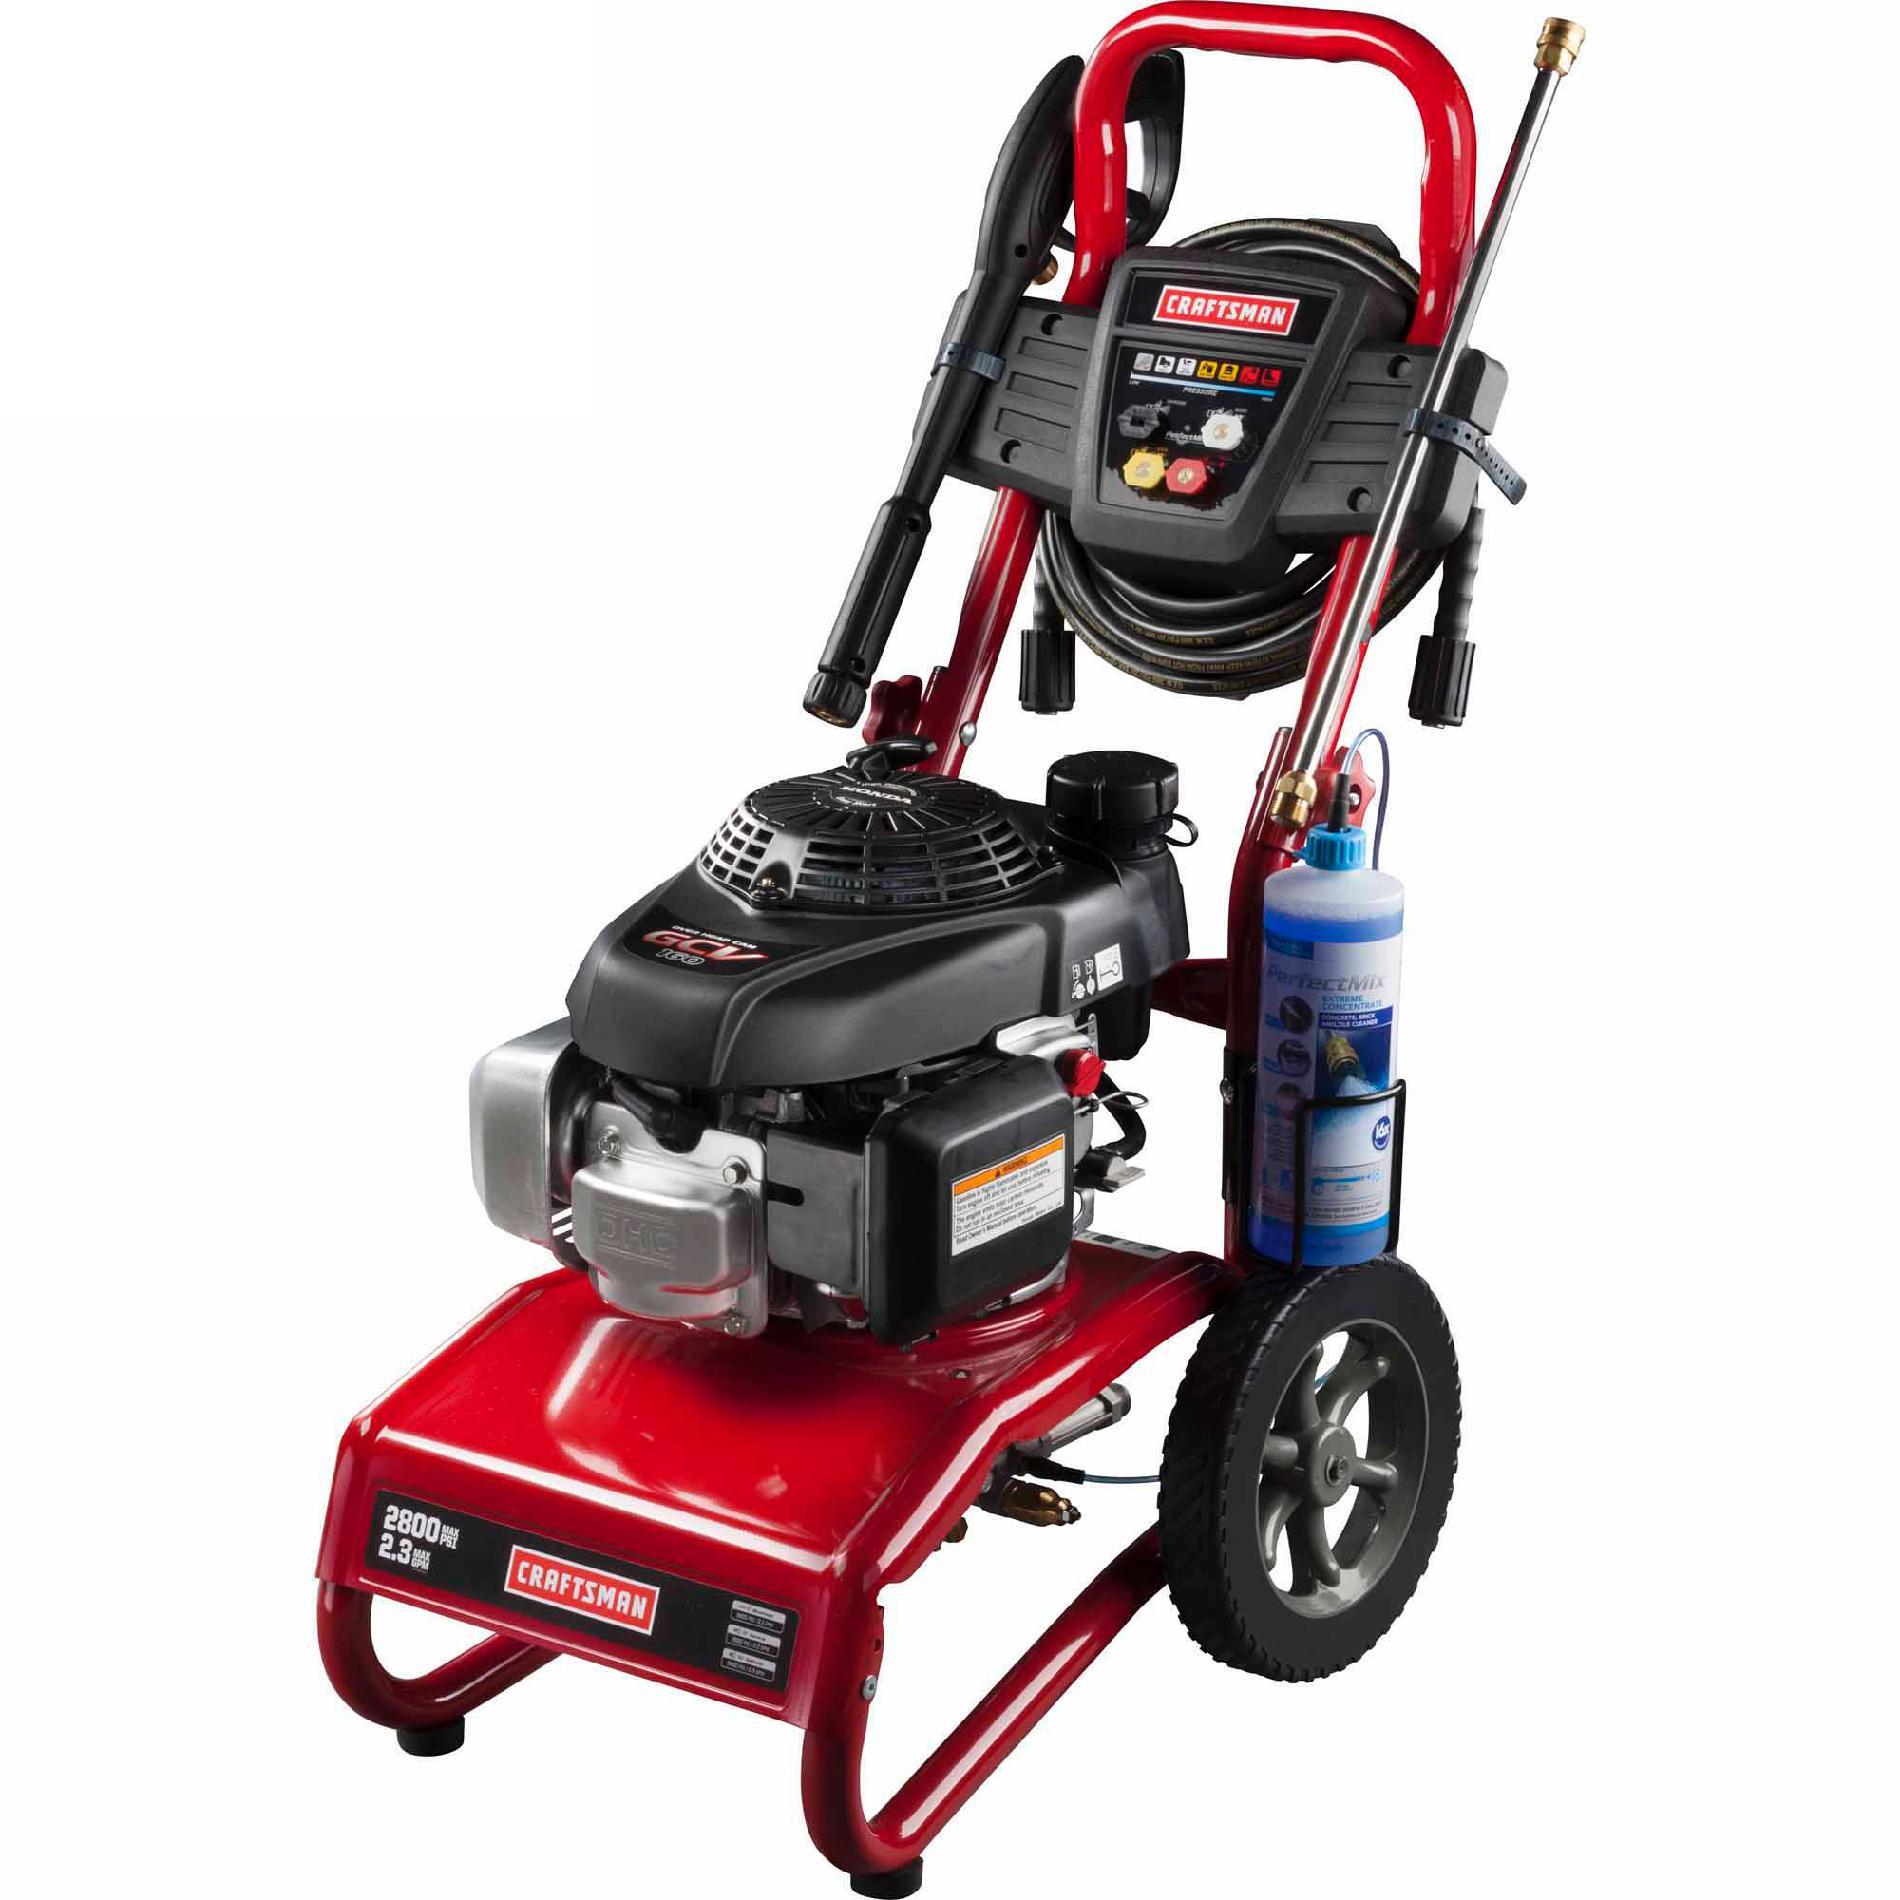 Craftsman 020579 2800psi 2.3 Gpm Gas-powered Pressure Washer